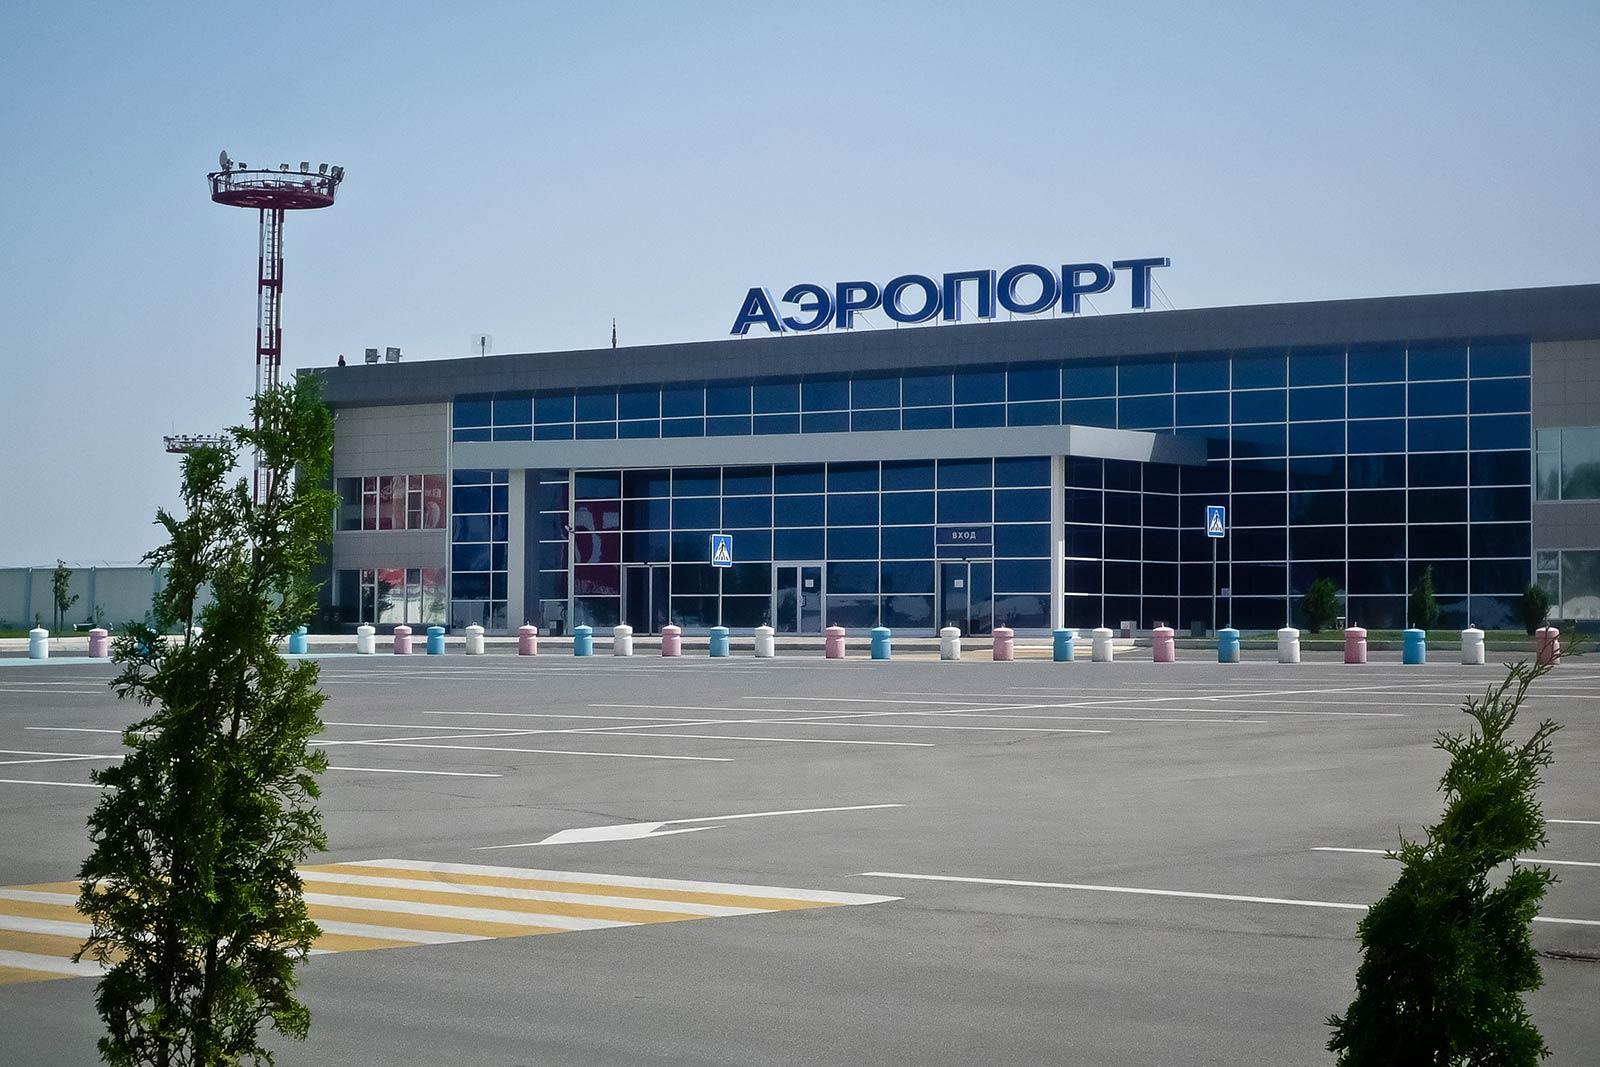 Аэропорт-Астрахань-Нариманово